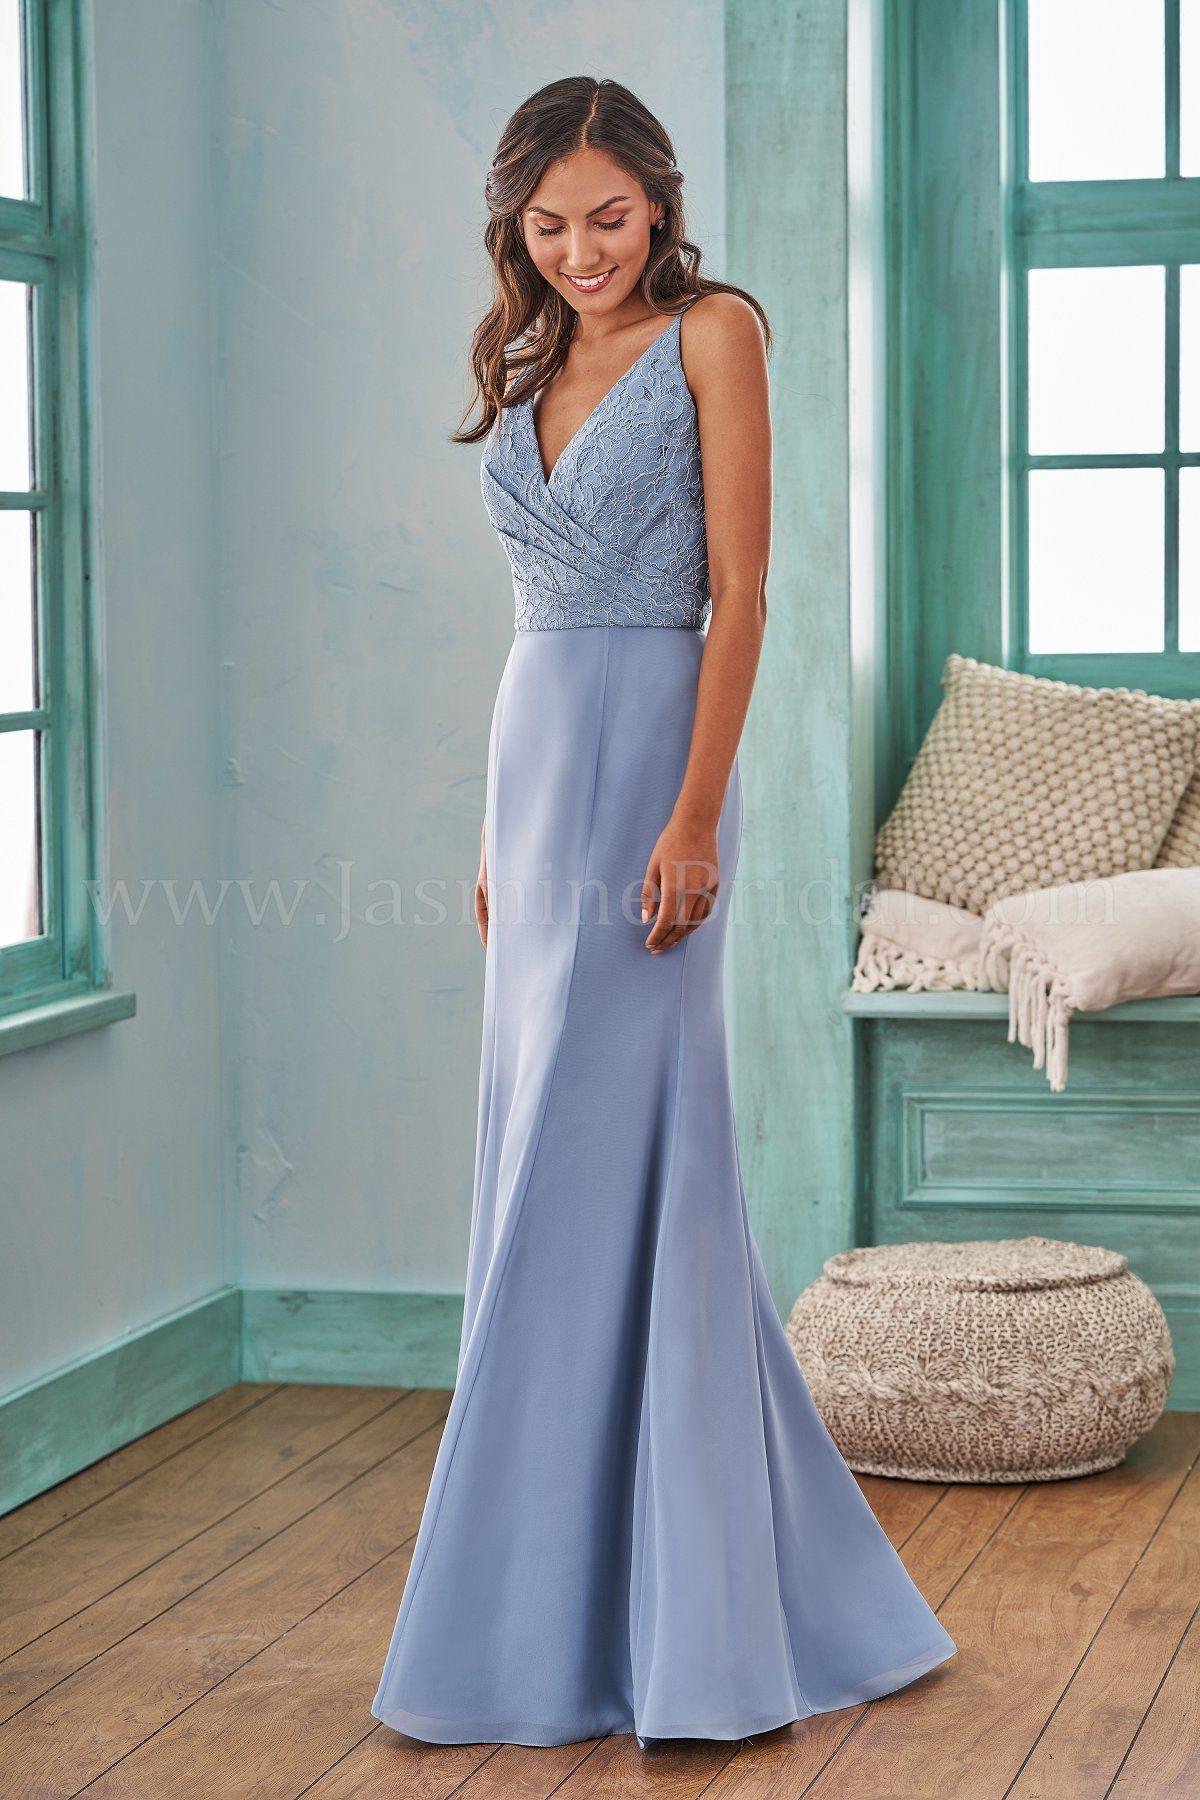 5246317d552e Jasmine Bridal | B2 Style B203007 in Bluestone | Lace/Poly Chiffon | Fit & Flare  Bridesmaid Dress | V-Neckline | Criss-Cross Straps | Lace Bodice | Poly ...